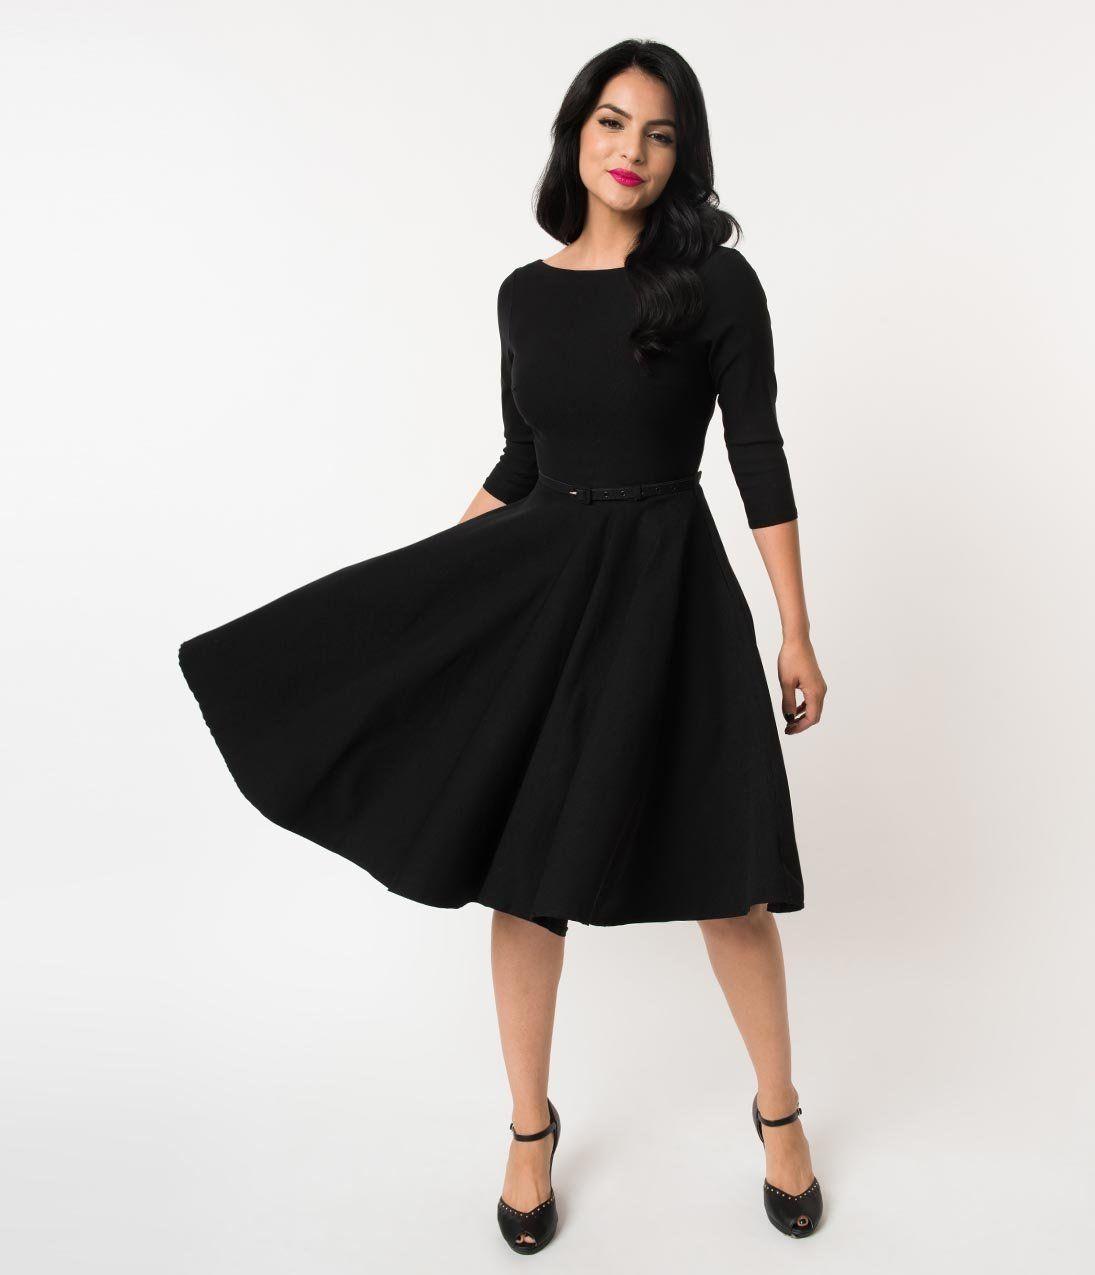 c861f13e73e Unique Vintage 1950s Style Black Stretch Sleeved Devon Swing Dress